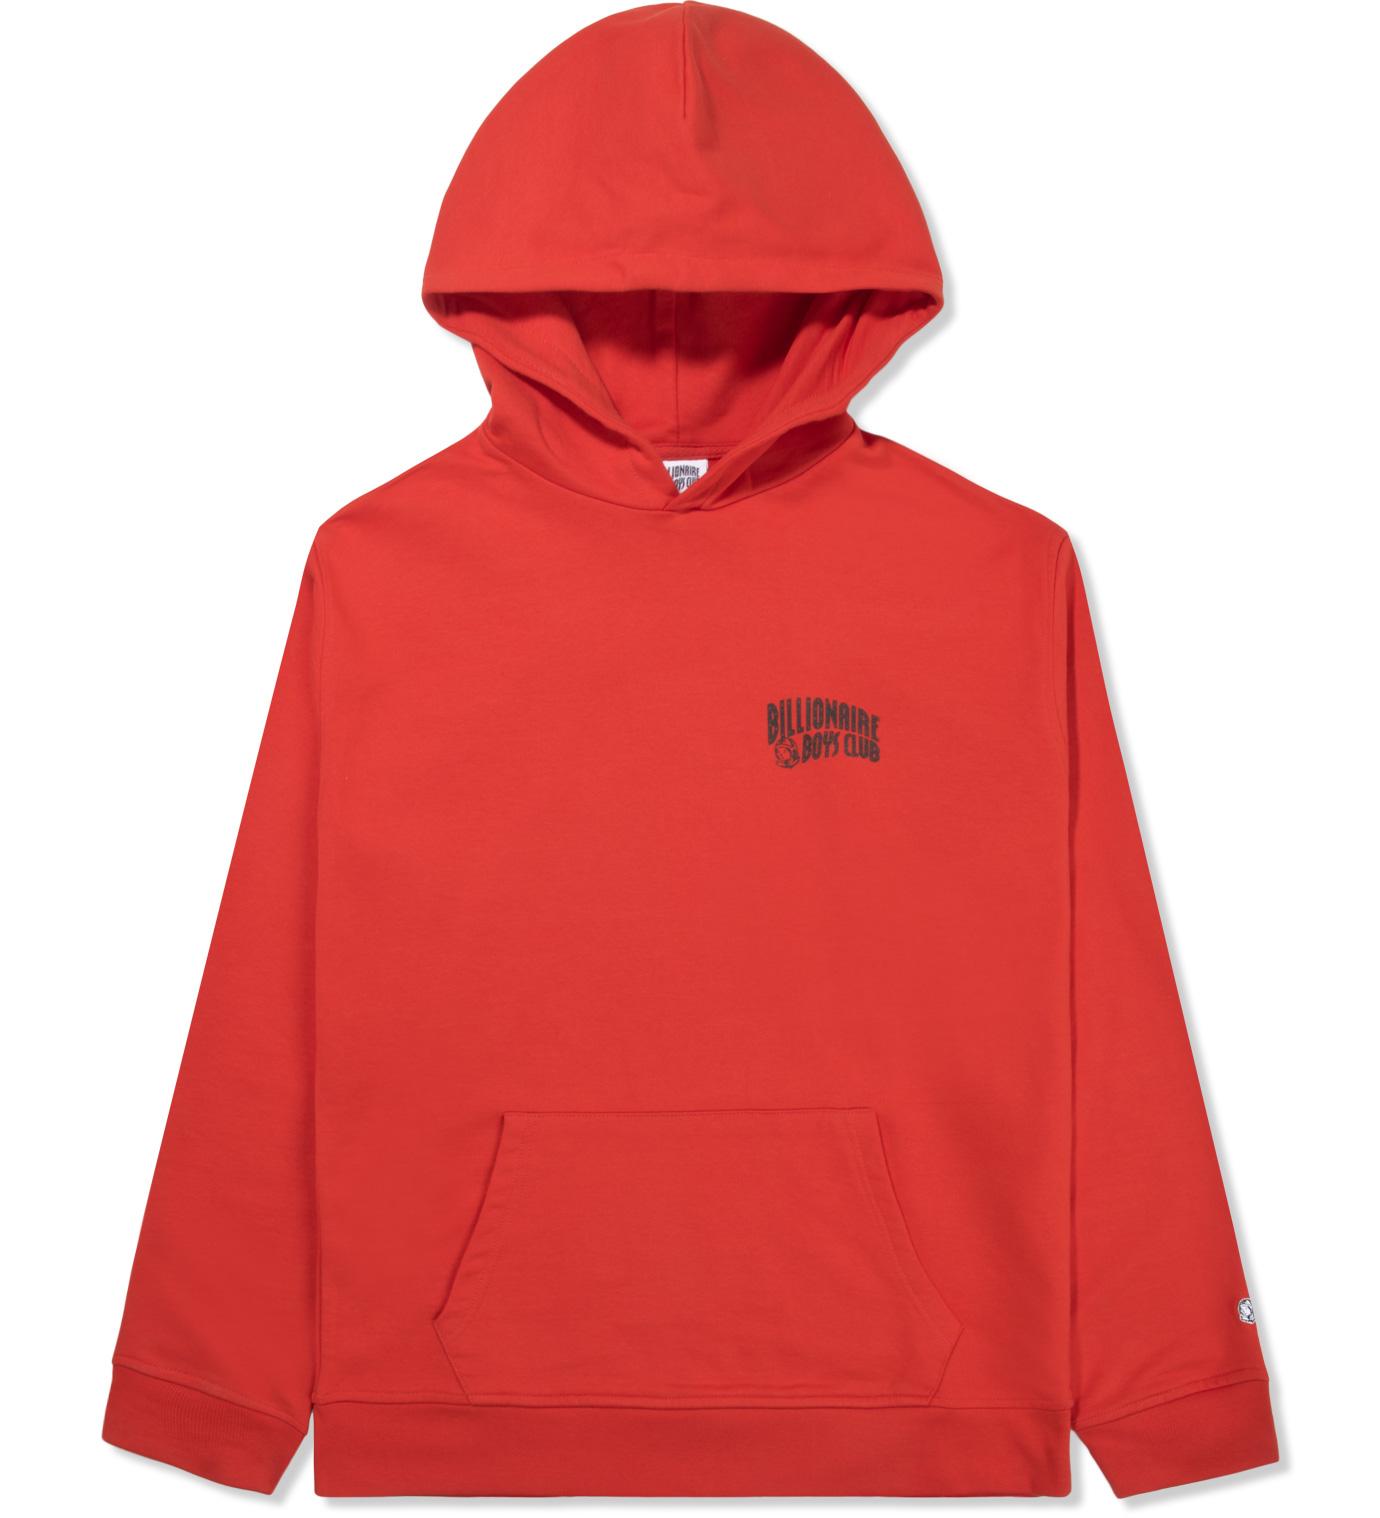 Bbc hoodies